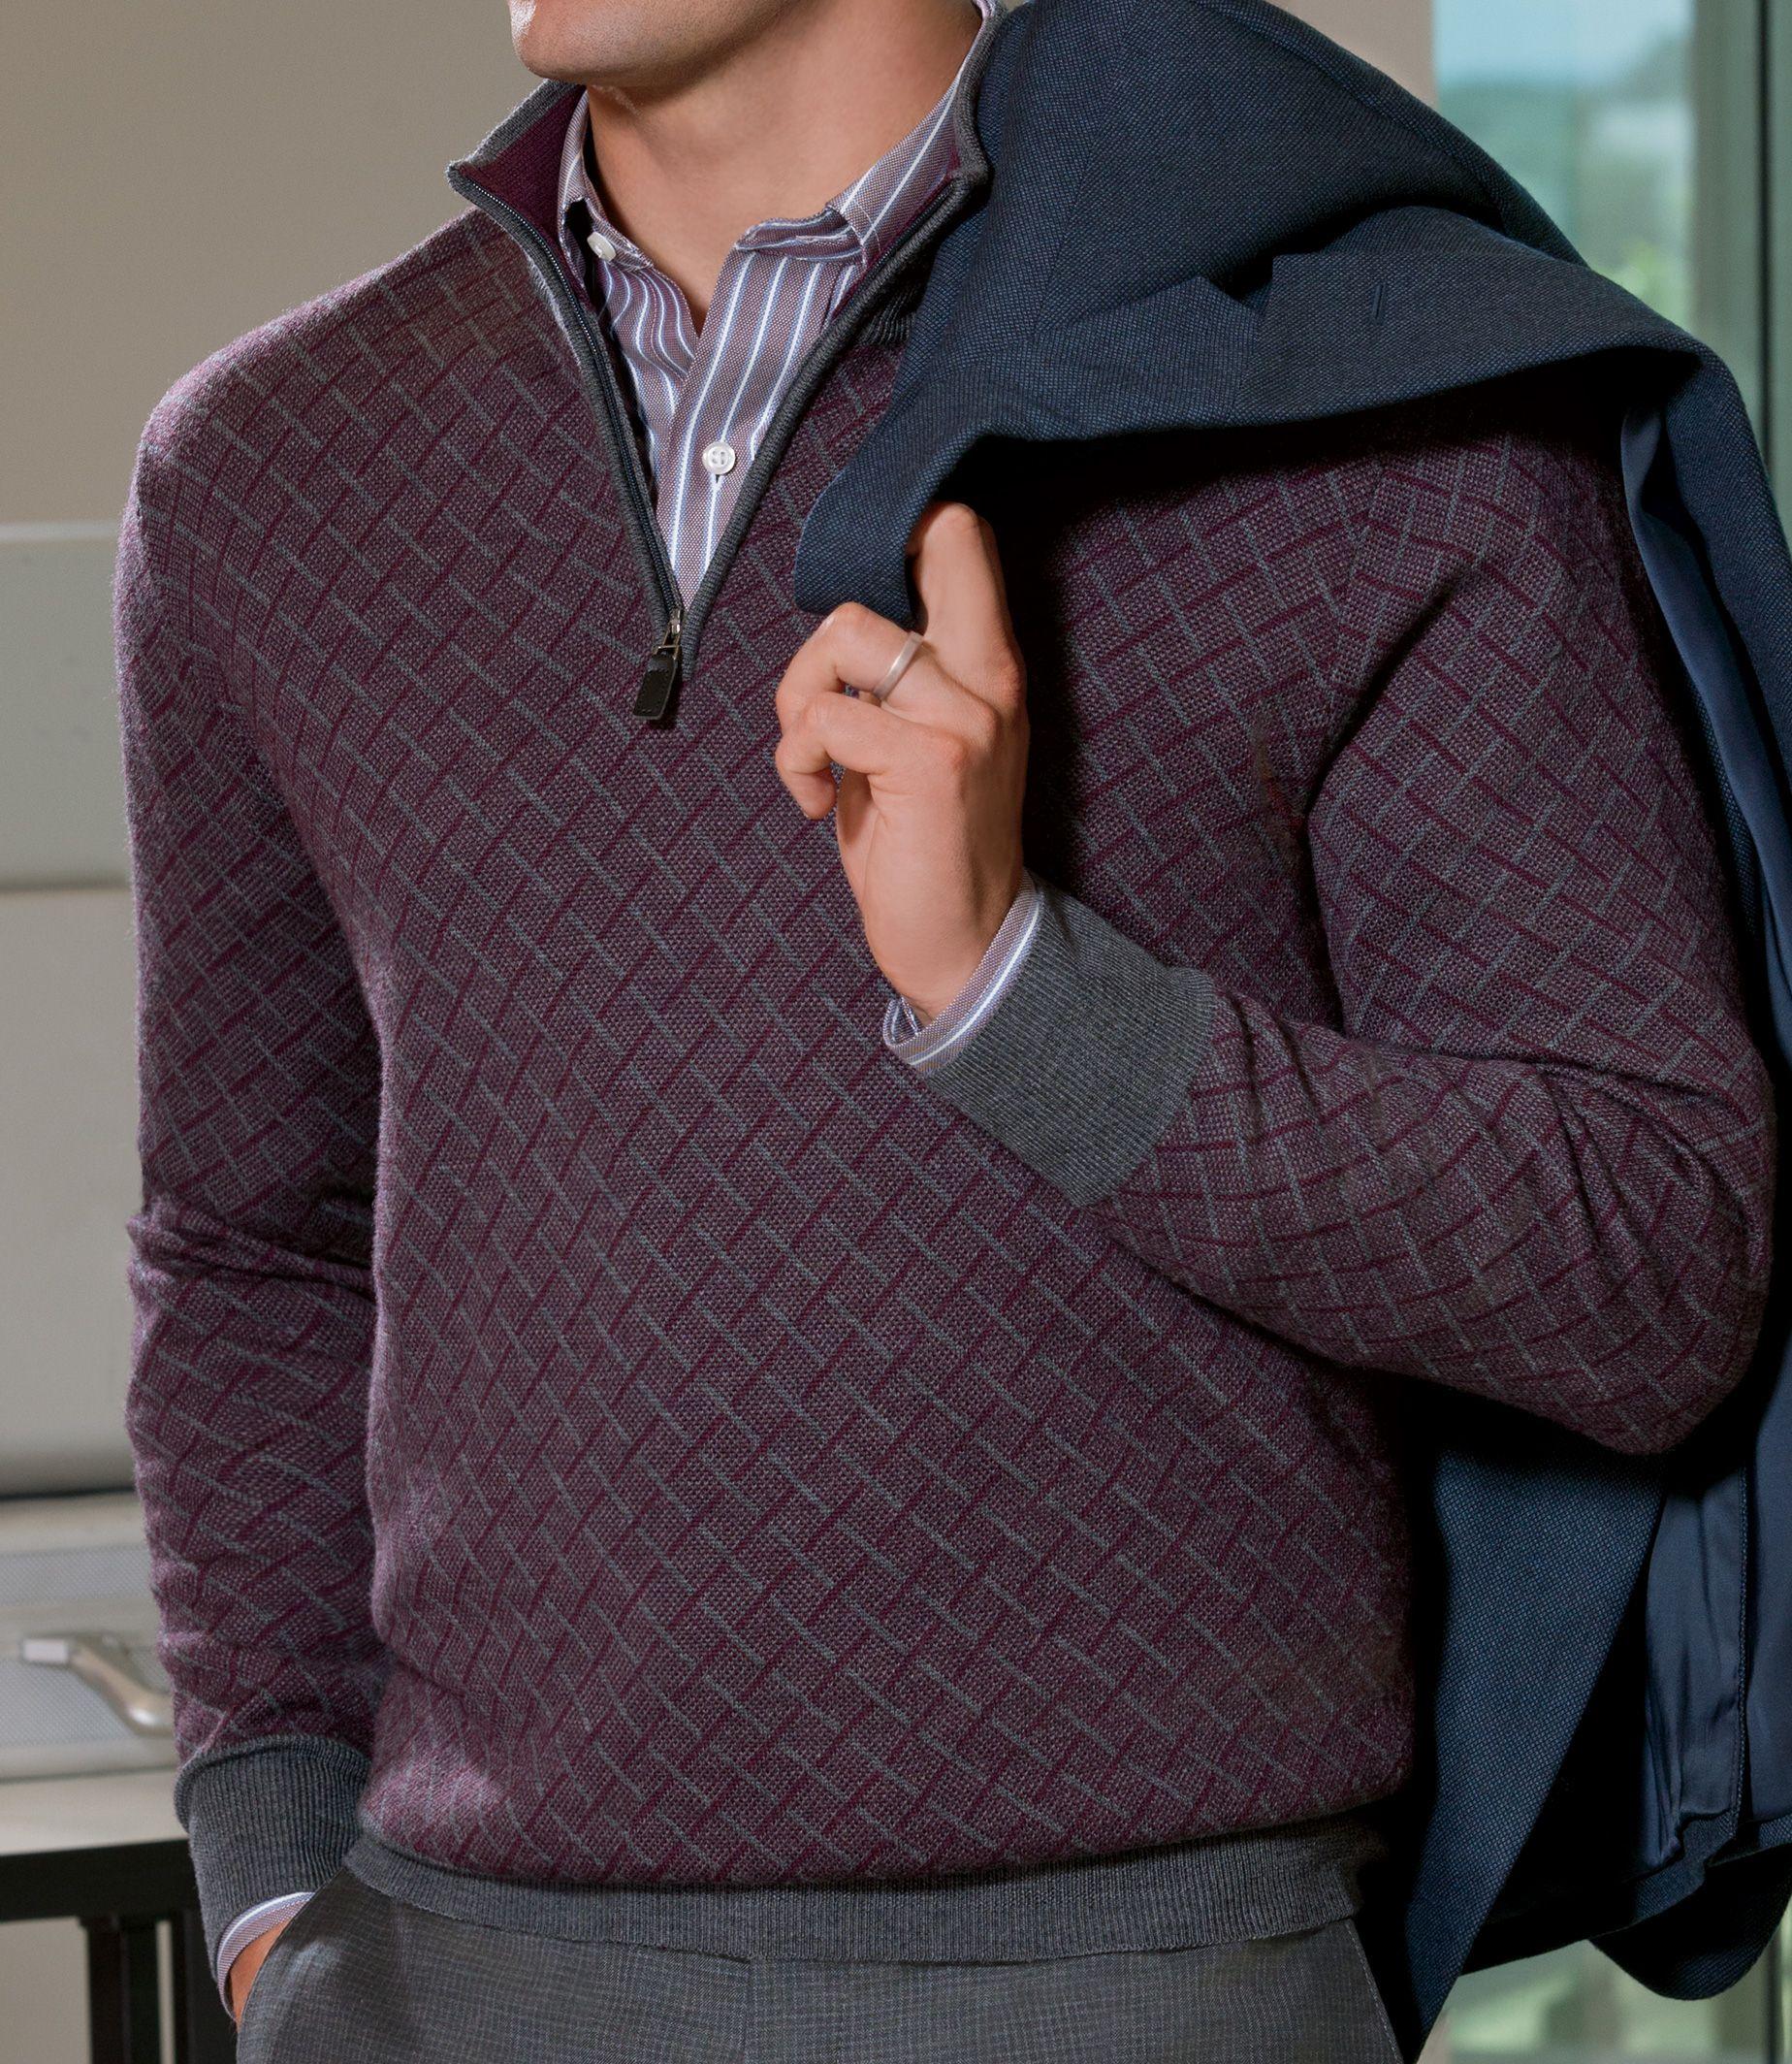 Signature Collection Merino Wool Birdseye Quarter Zip Sweater Clearance Half Zip Sweaters Casual Wear For Men Knitwear Men